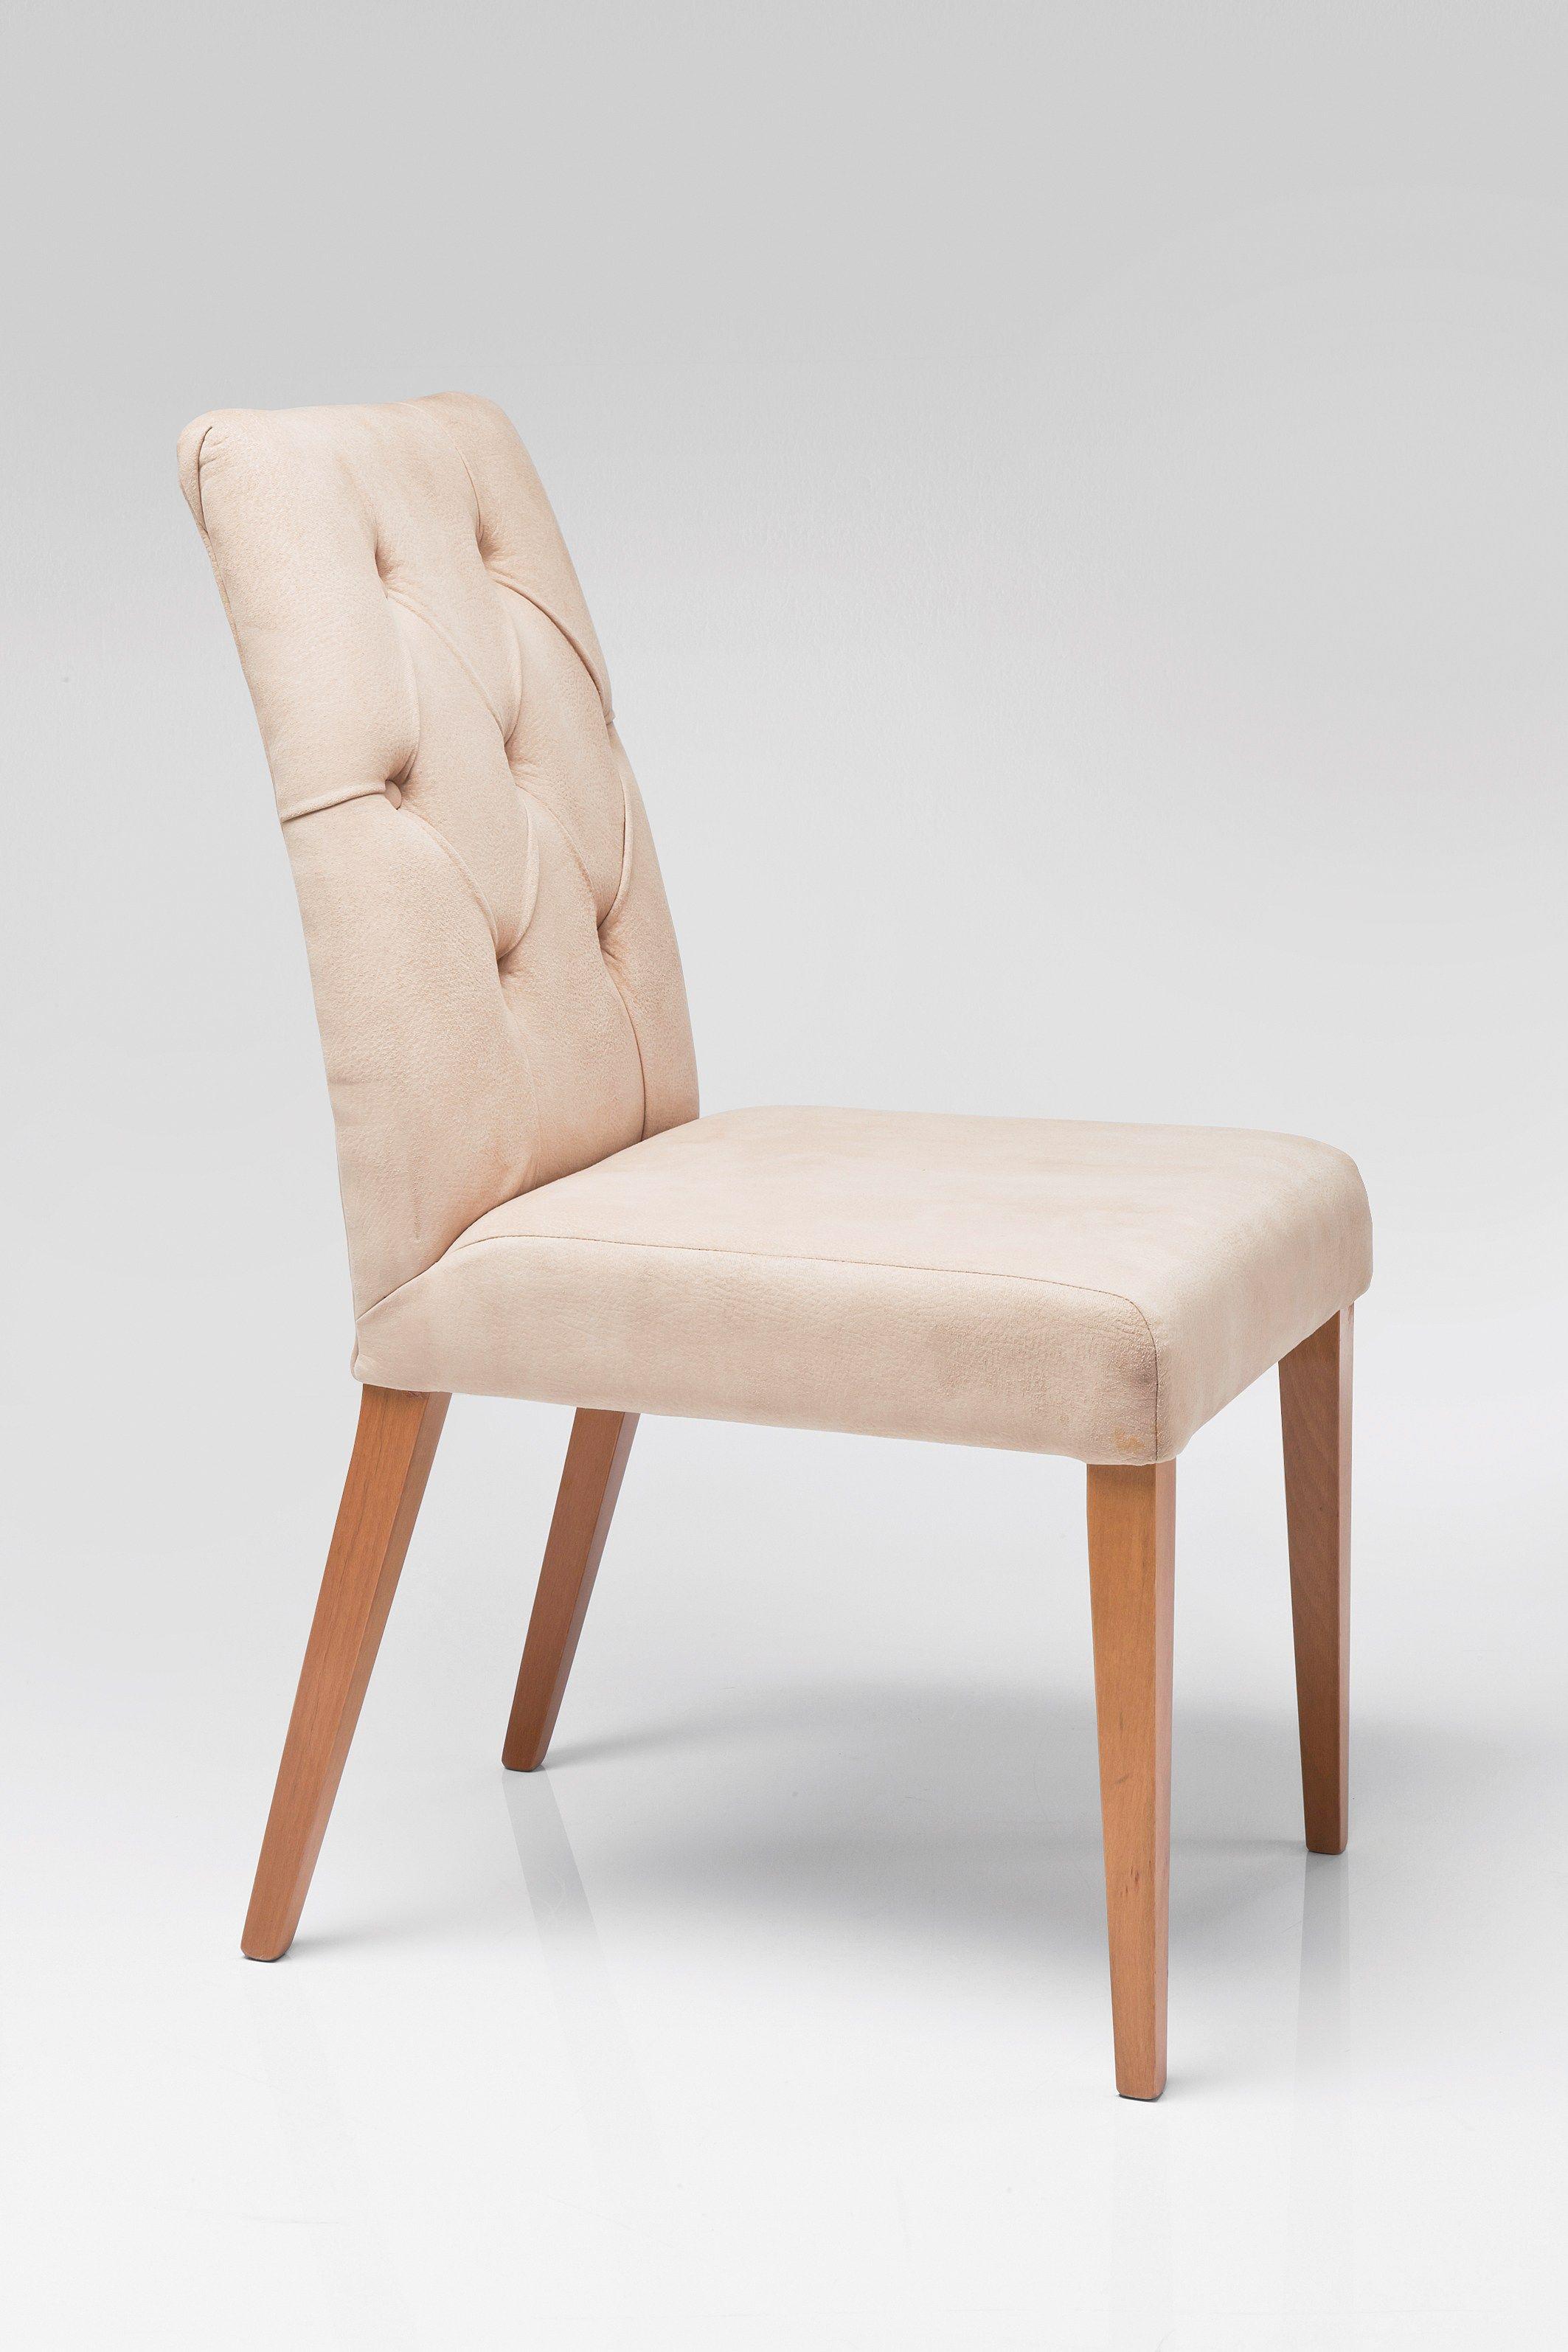 chaise capitonn e de style contemporain casual buttons by kare design. Black Bedroom Furniture Sets. Home Design Ideas